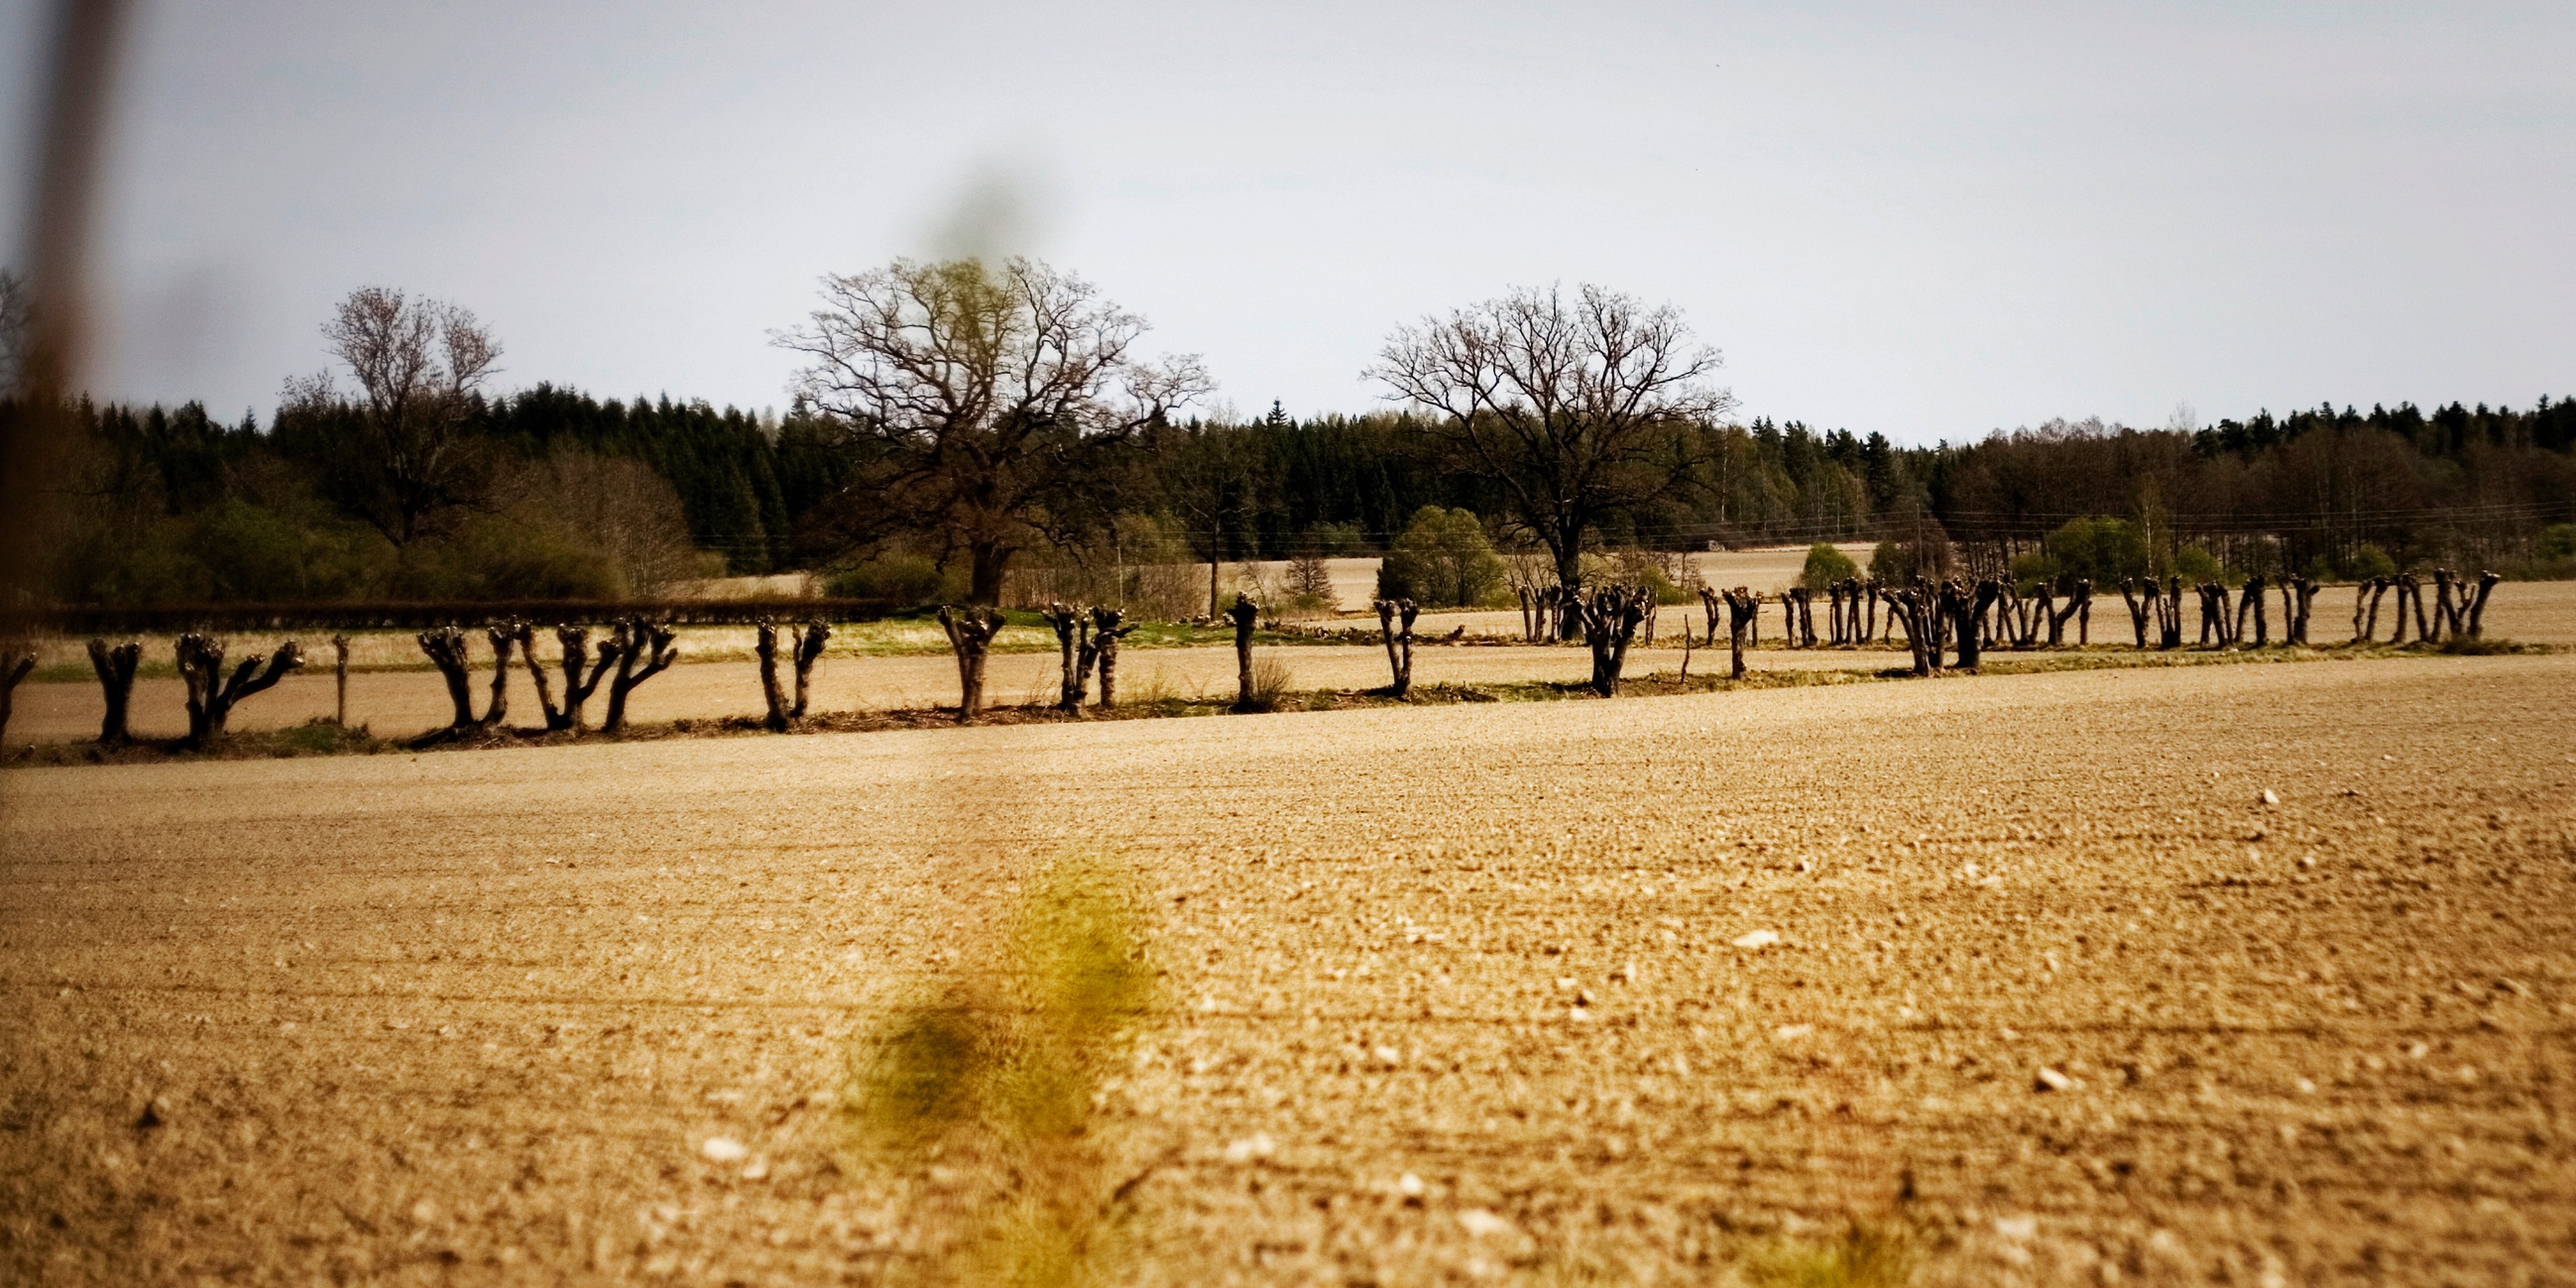 jordbruks-dejtingsajt kommersiella